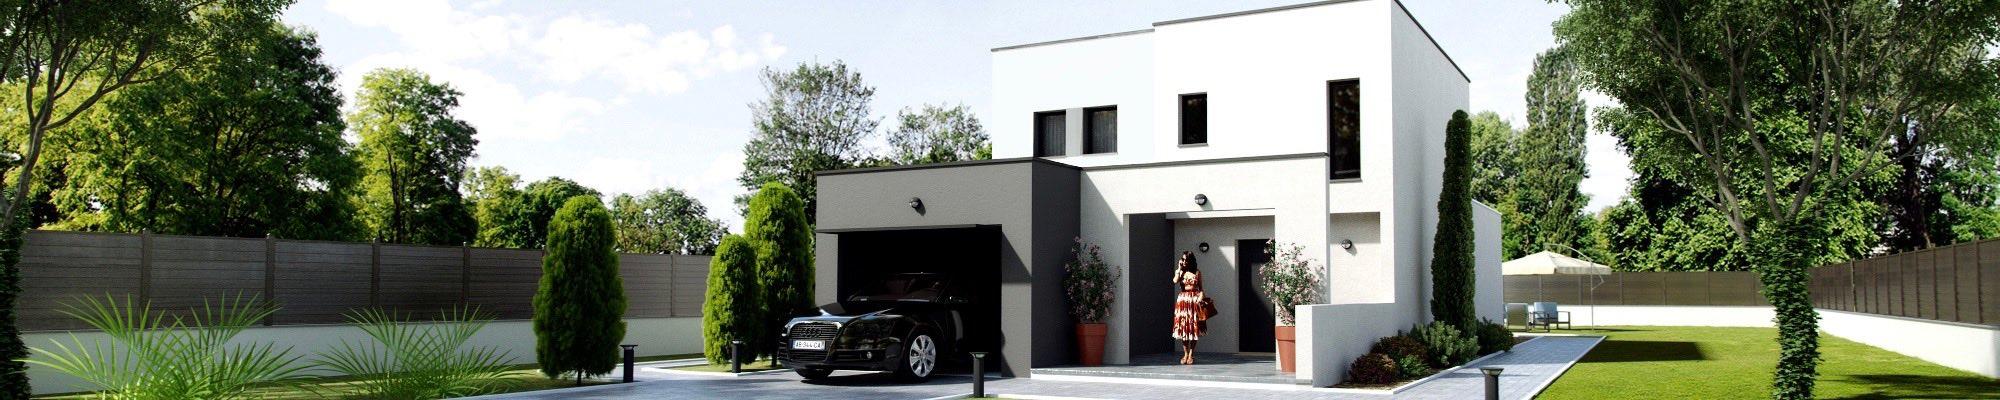 avis maison ericlor gallery of finest dcoration maison moderne avec jardin strasbourg ilot. Black Bedroom Furniture Sets. Home Design Ideas